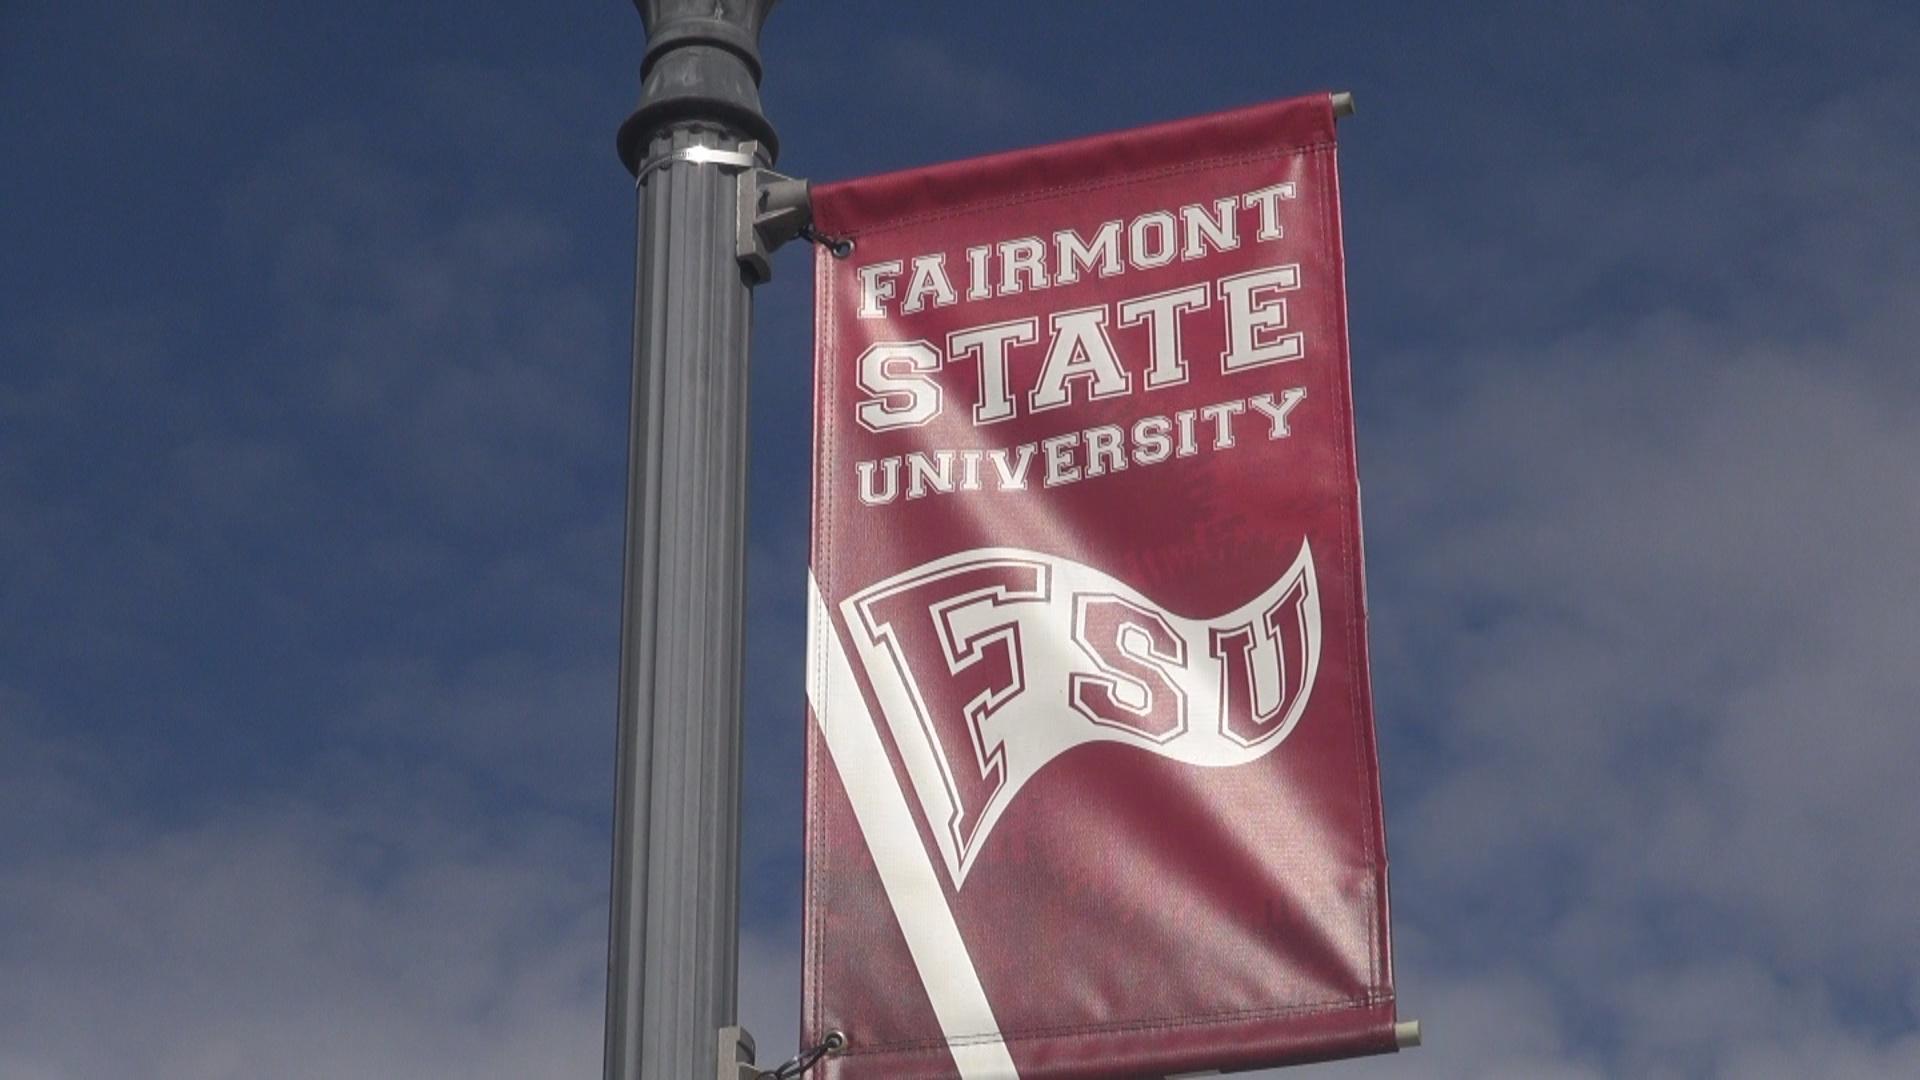 Fairmont State Falcons | WBOY.com